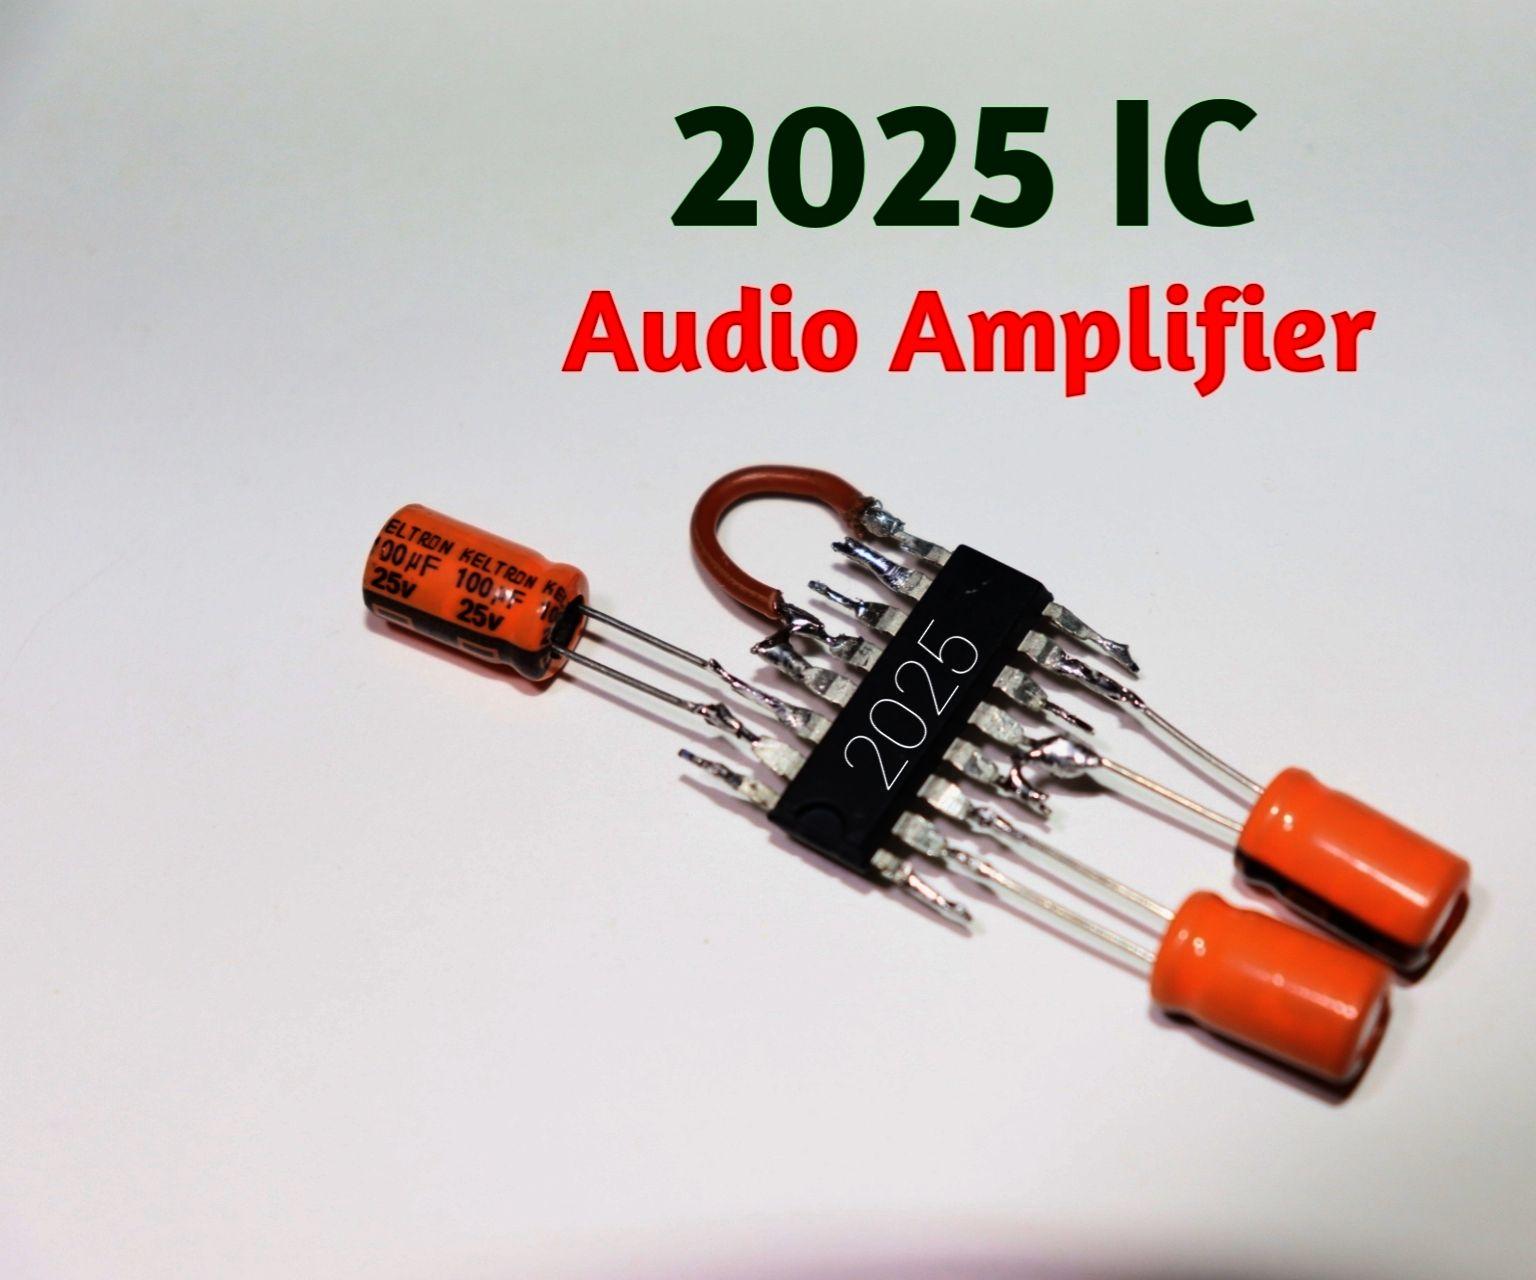 2025 IC Audio Amplifier